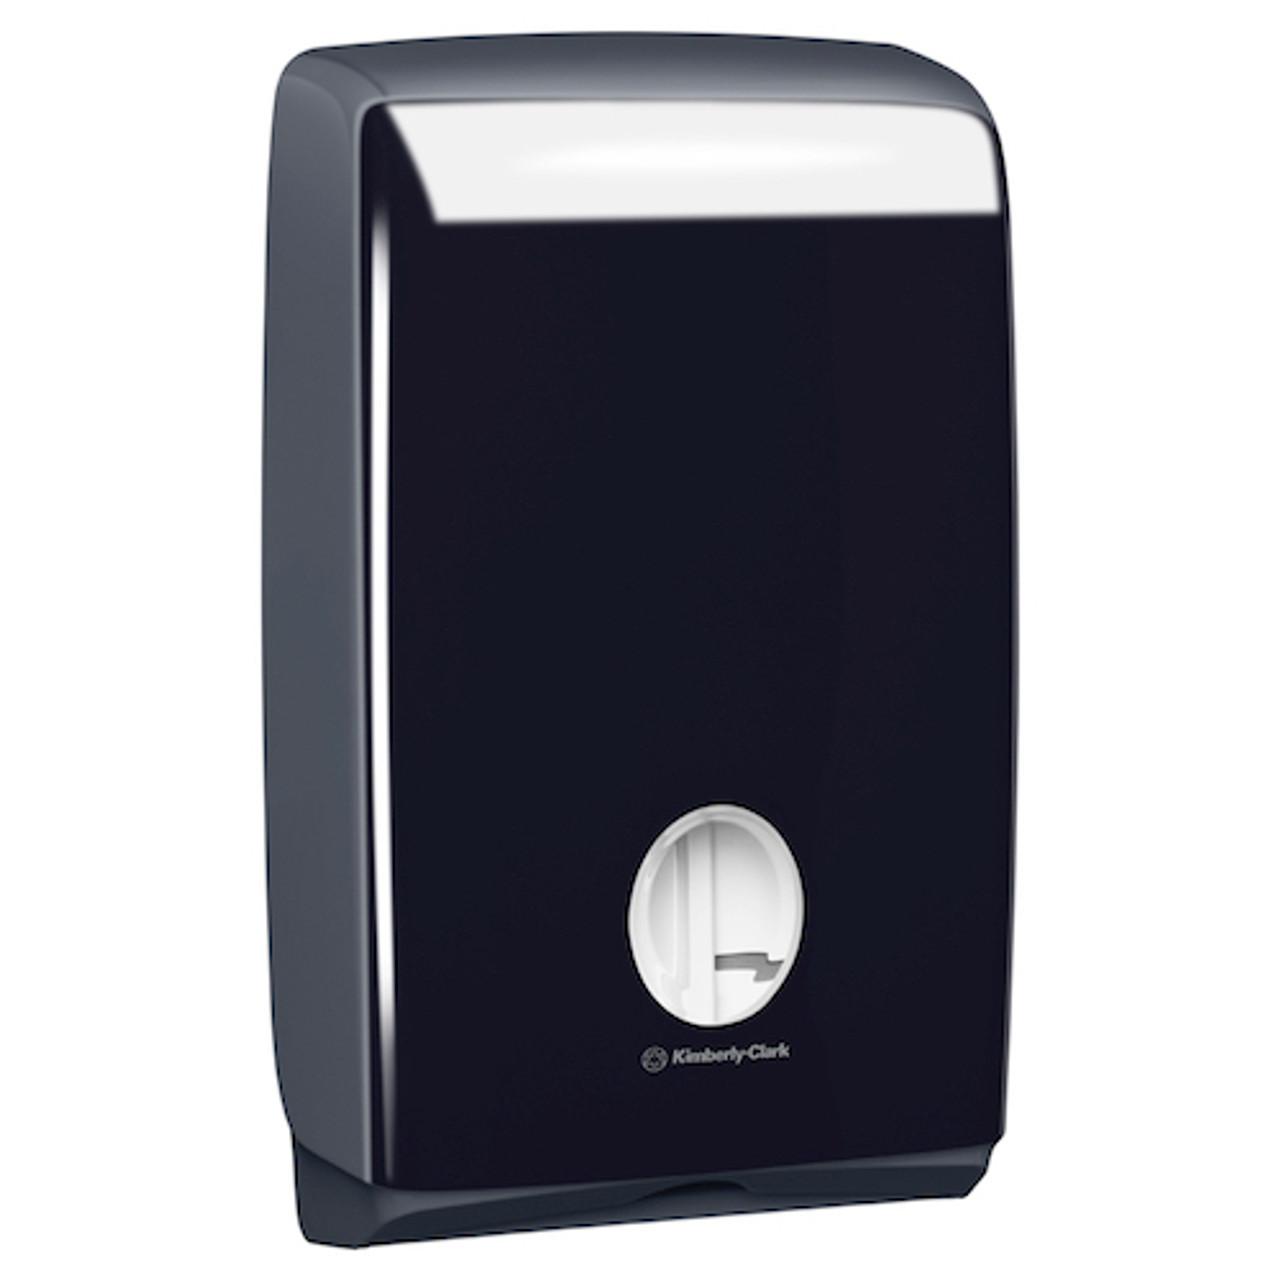 Kimberly Clark Aquarius Compact Hand Towel Black Dispenser (70007)